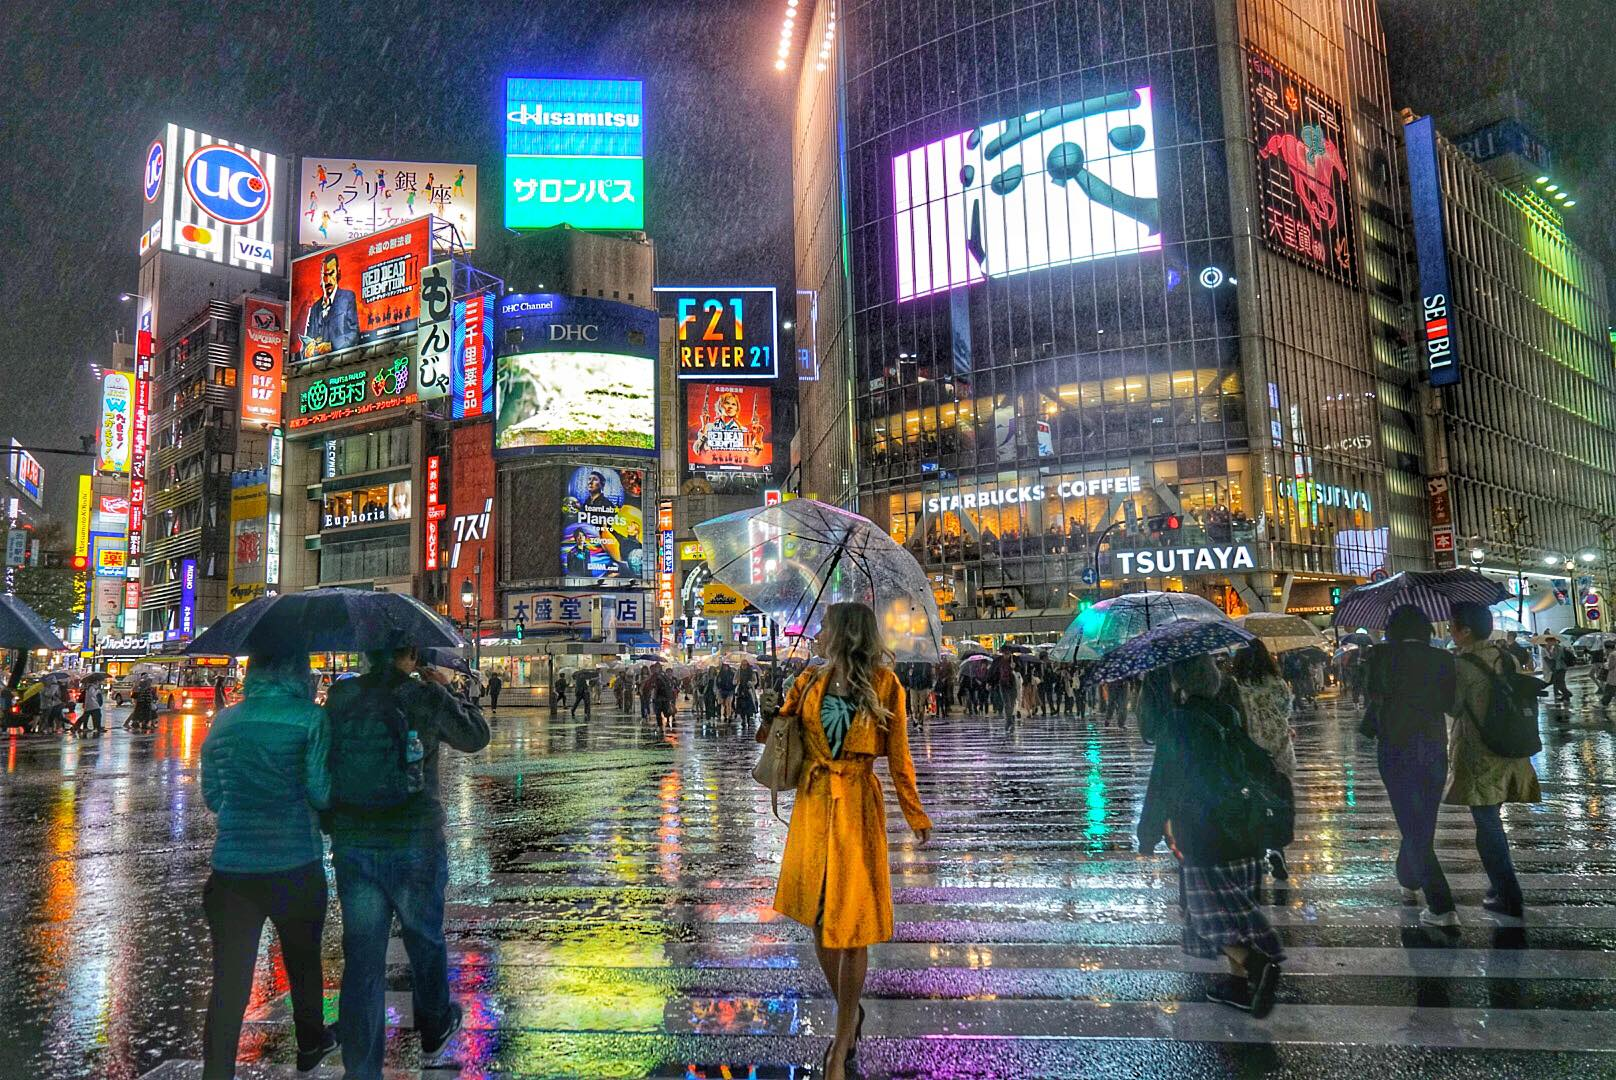 Tokyo Nightlife Shibuya Crossing Alyssa Ramos mylifesamovie.com